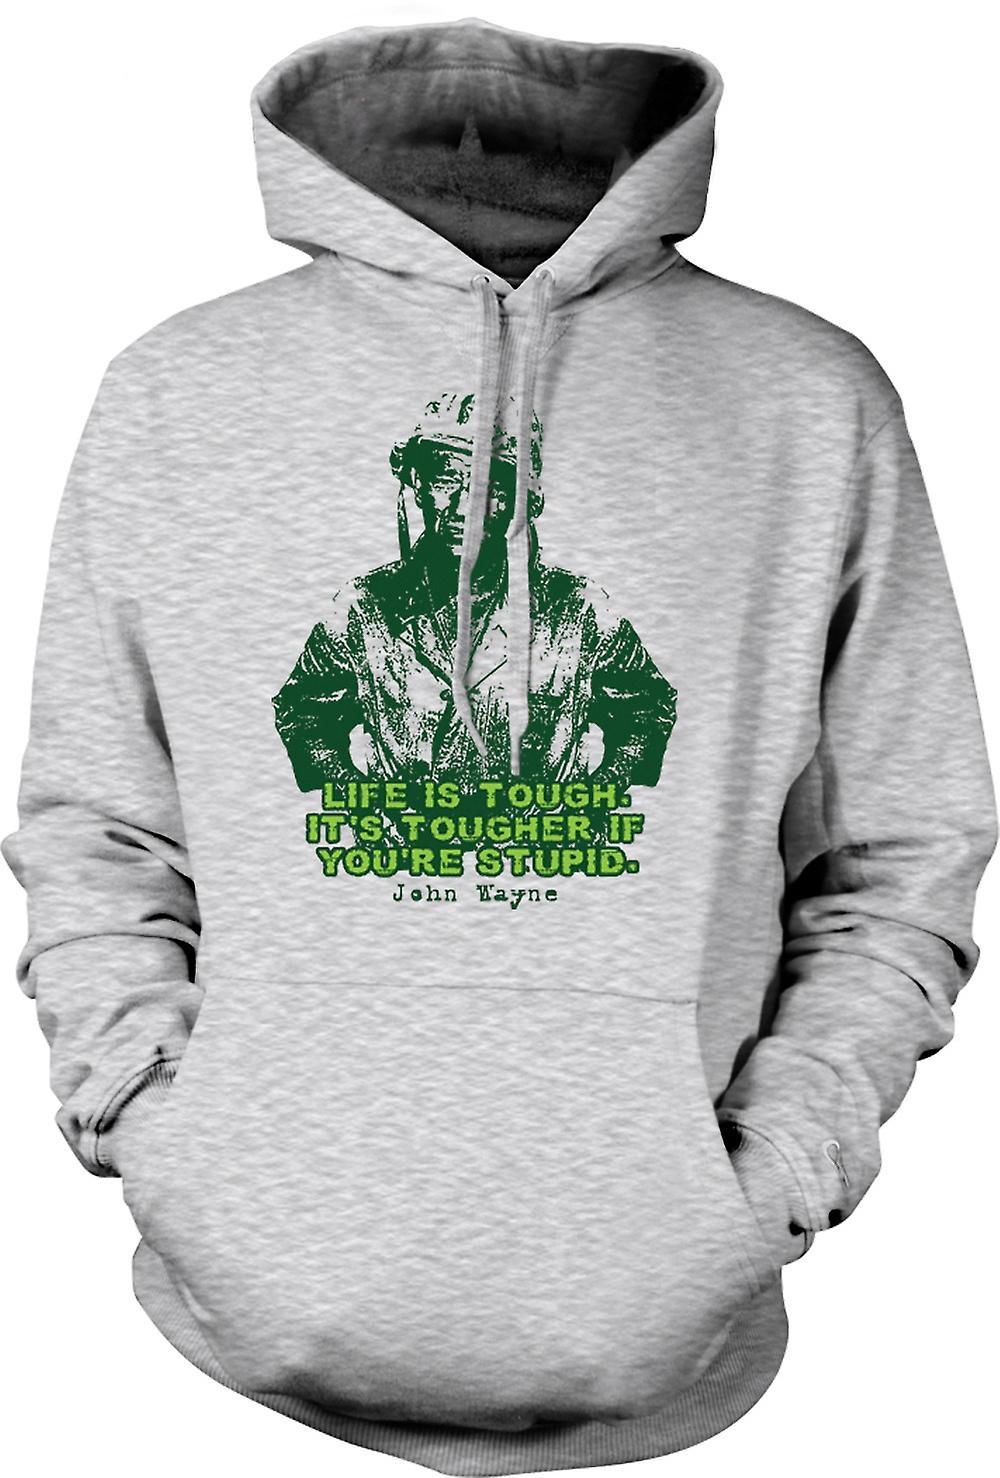 Mens Hoodie - John Wayne - Green Beret - WW2